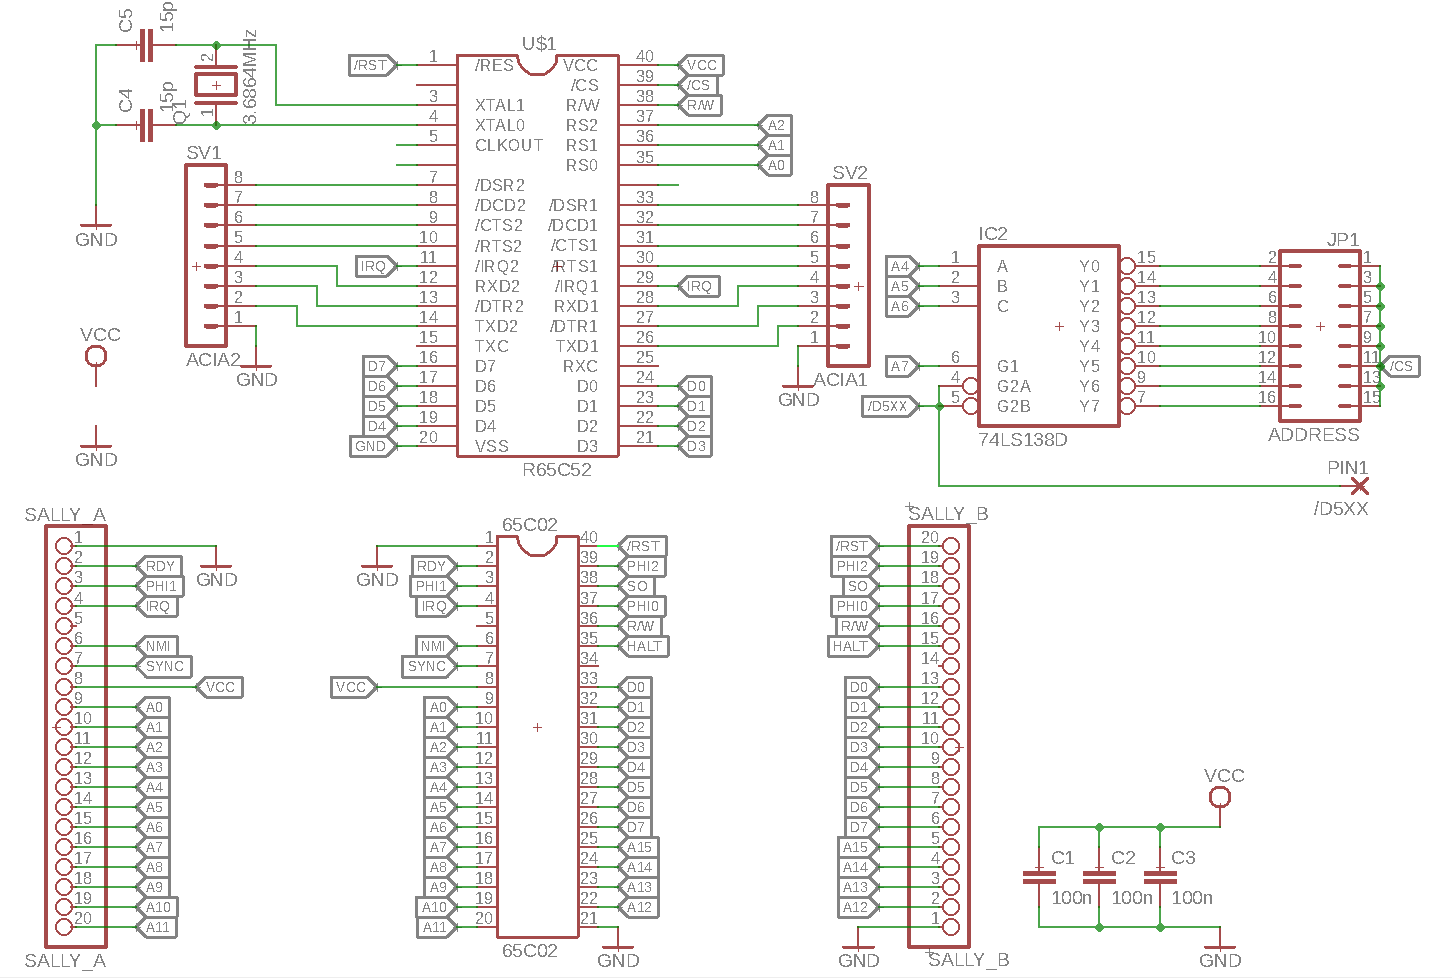 A2DACIAv1.0 schematic